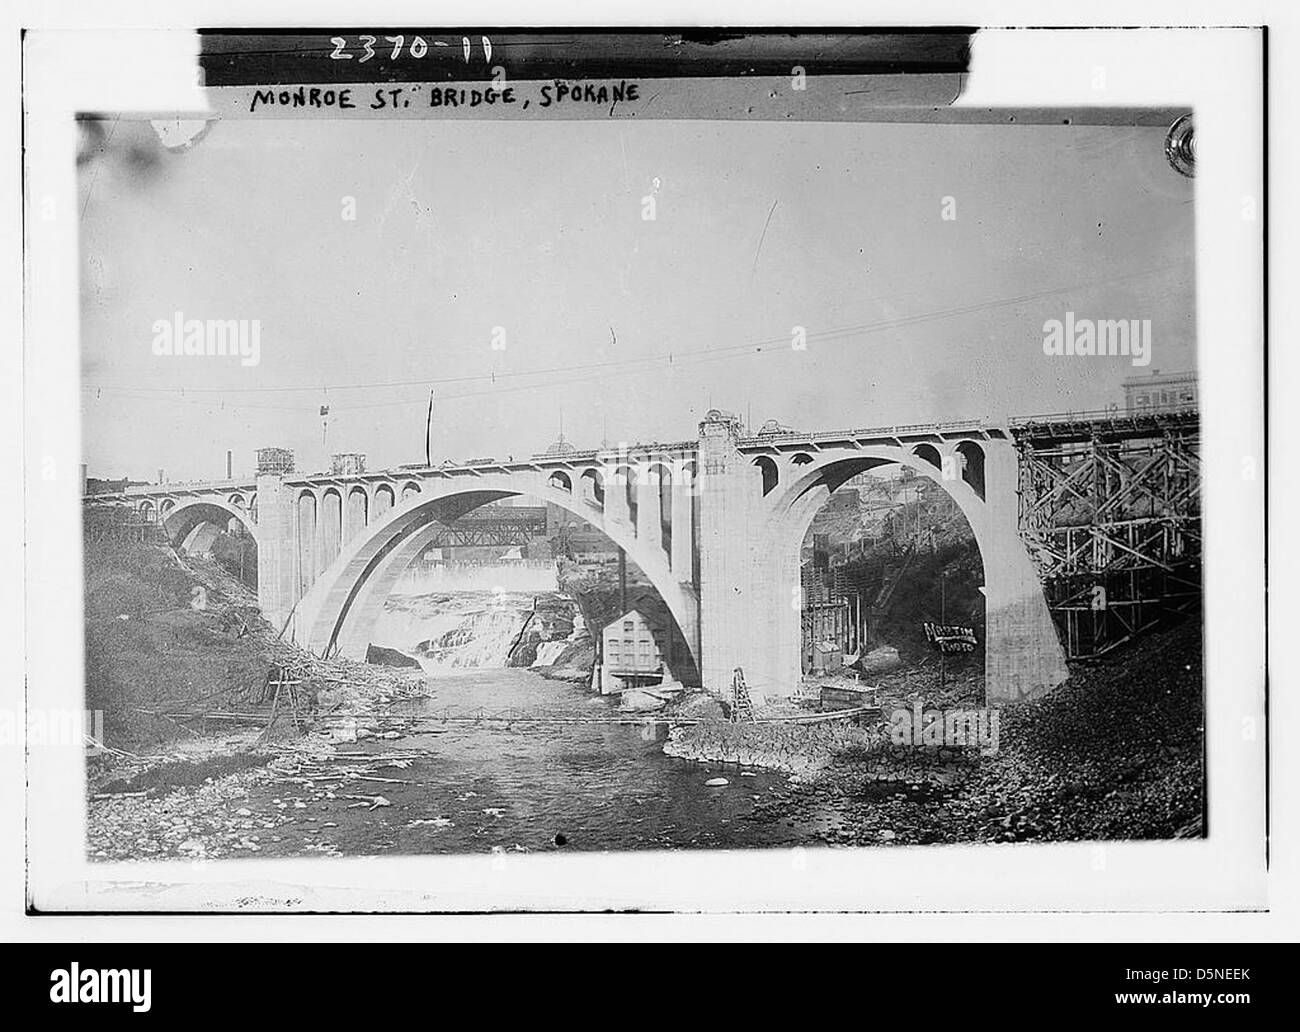 Monroe St. Bridge, Spokane (LOC) - Stock Image